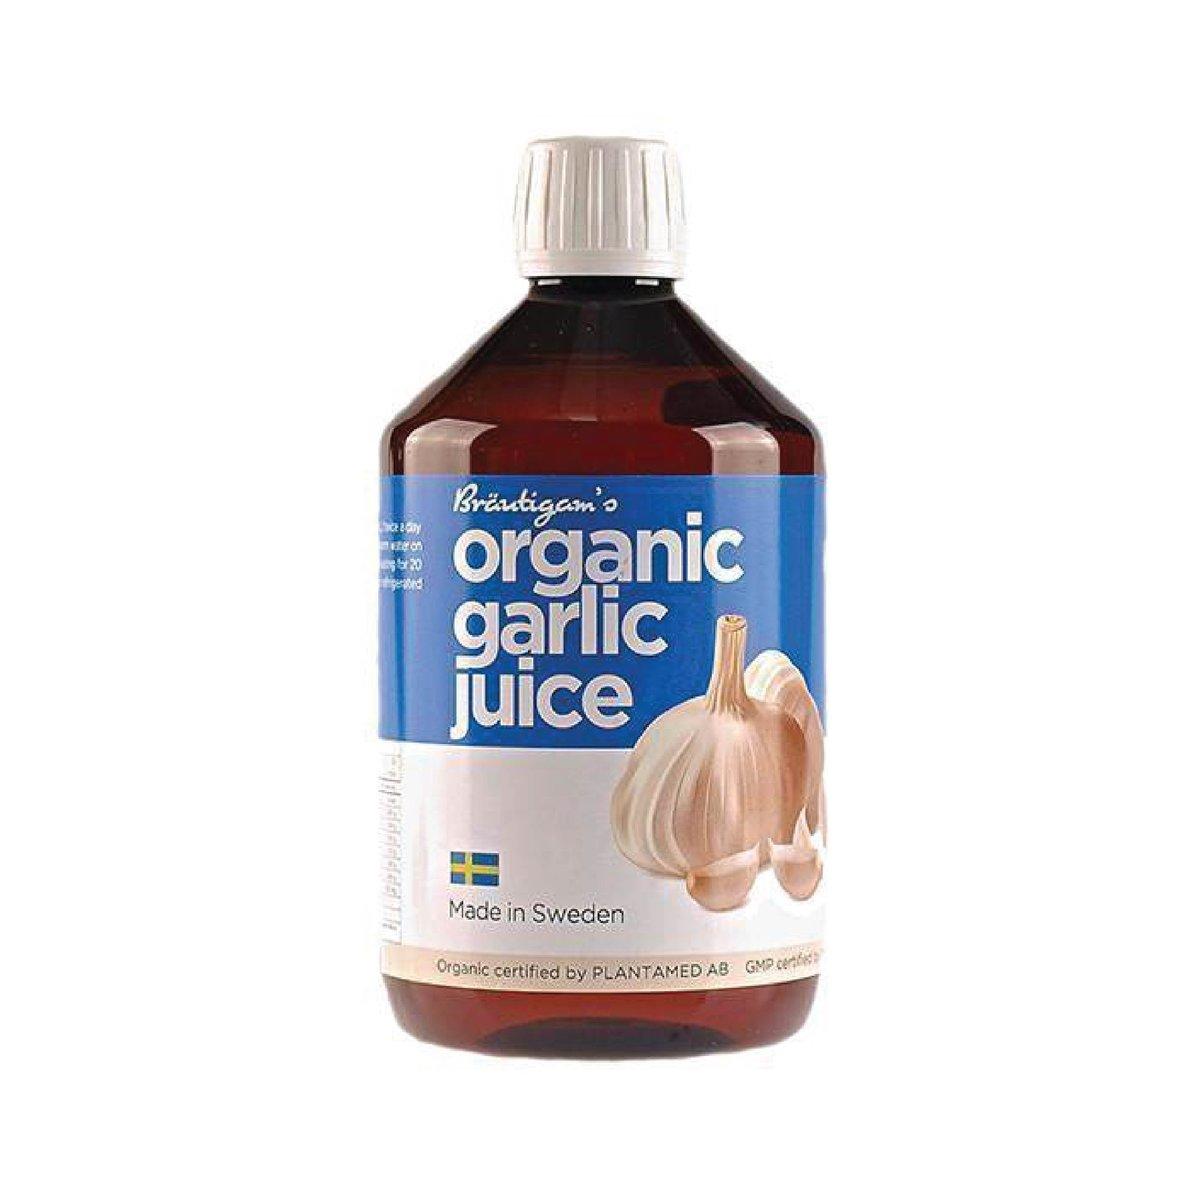 Organic Garlic Juice (digest, immunity, heart)